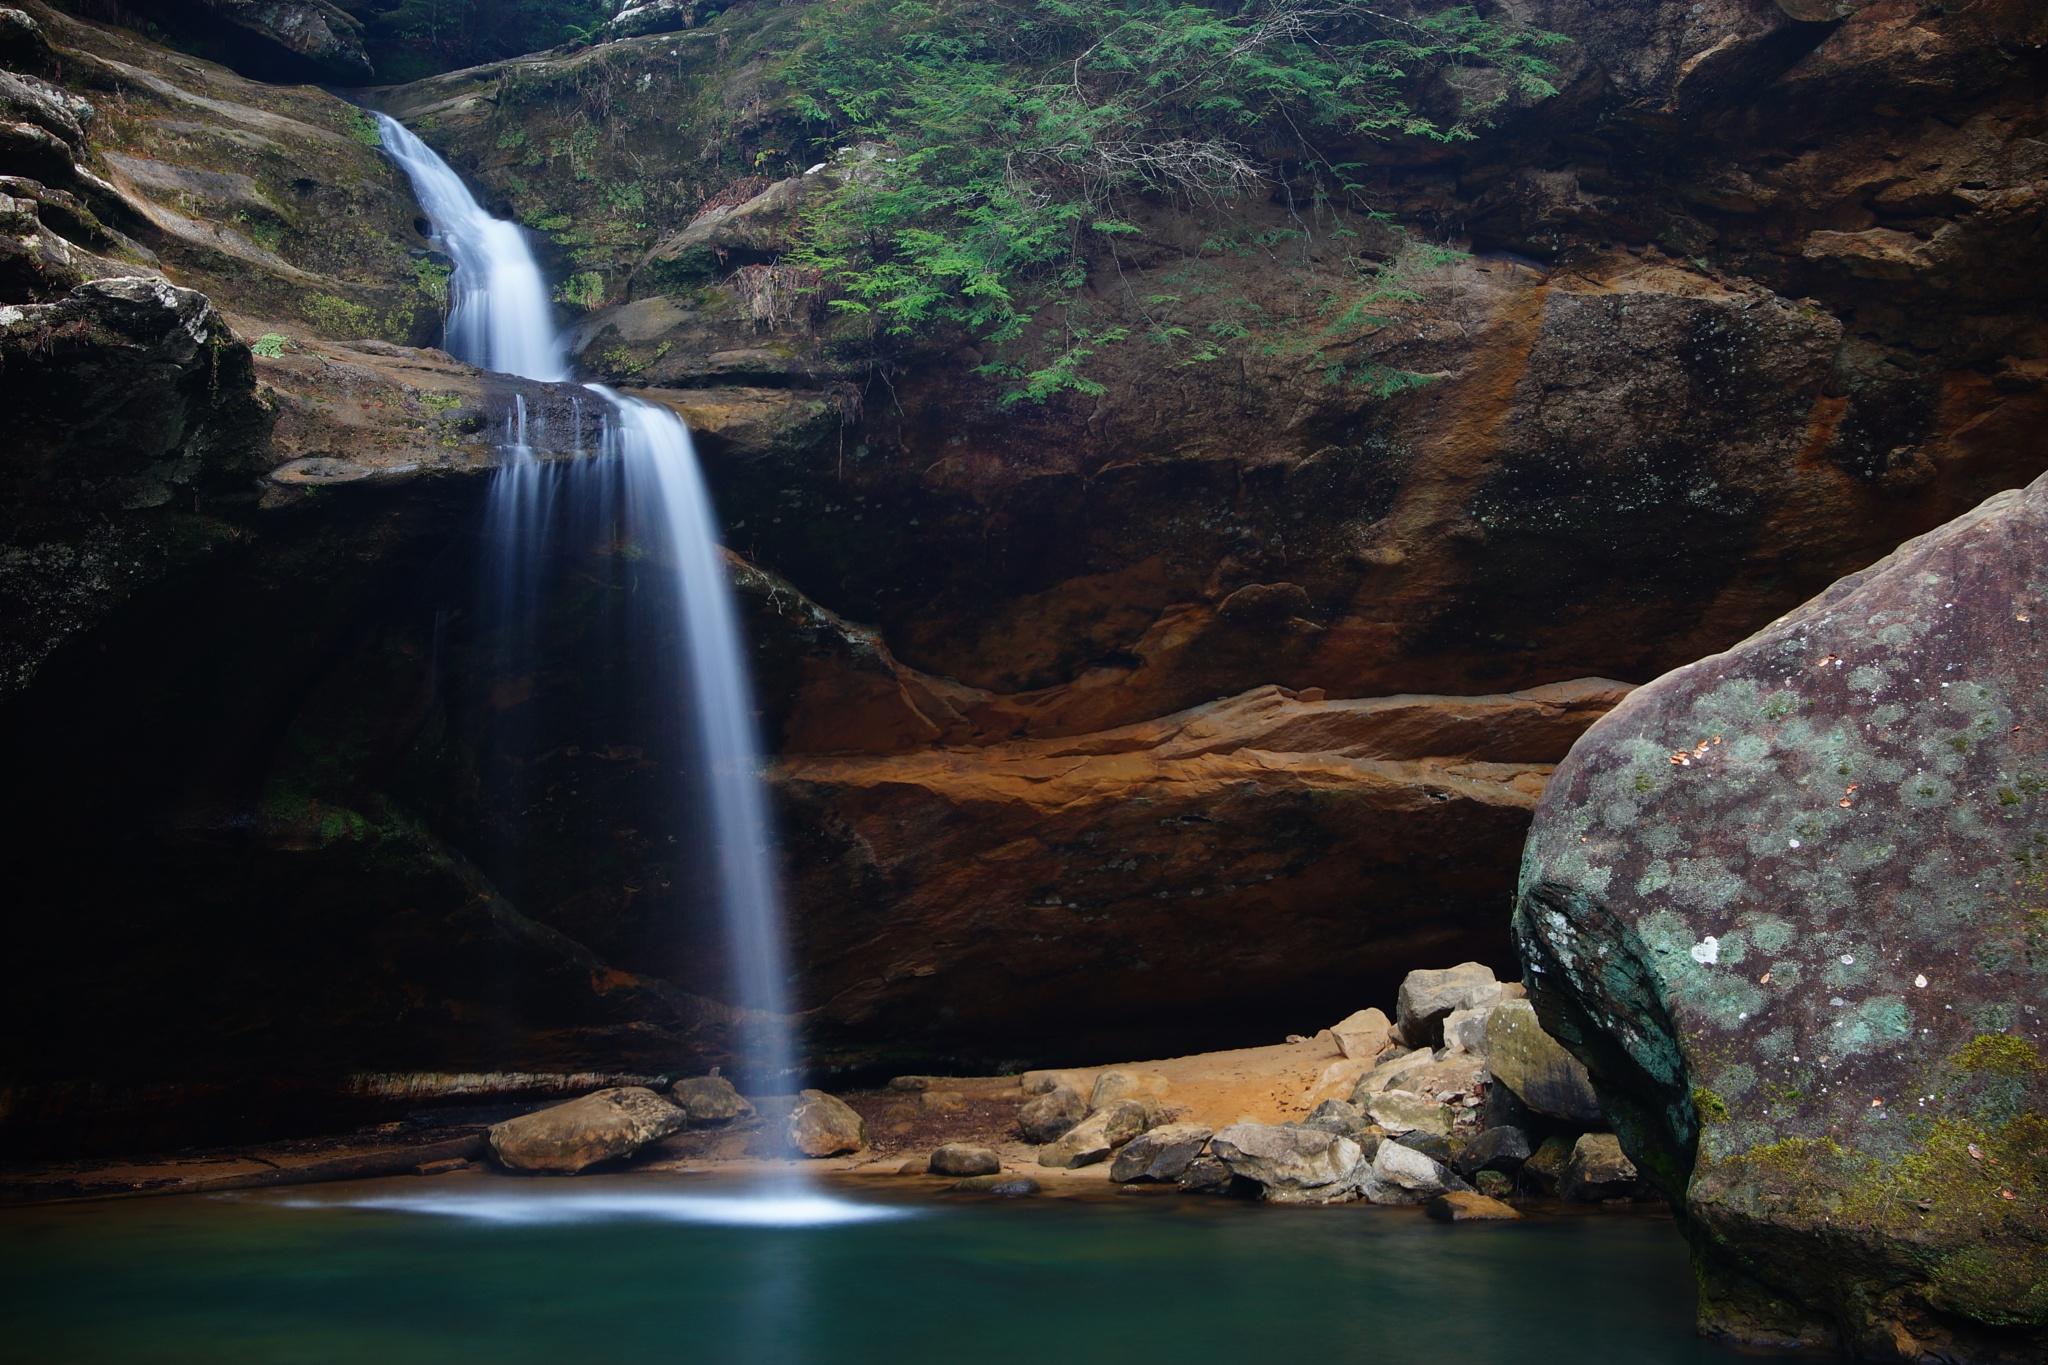 Lower Falls by craig koteles